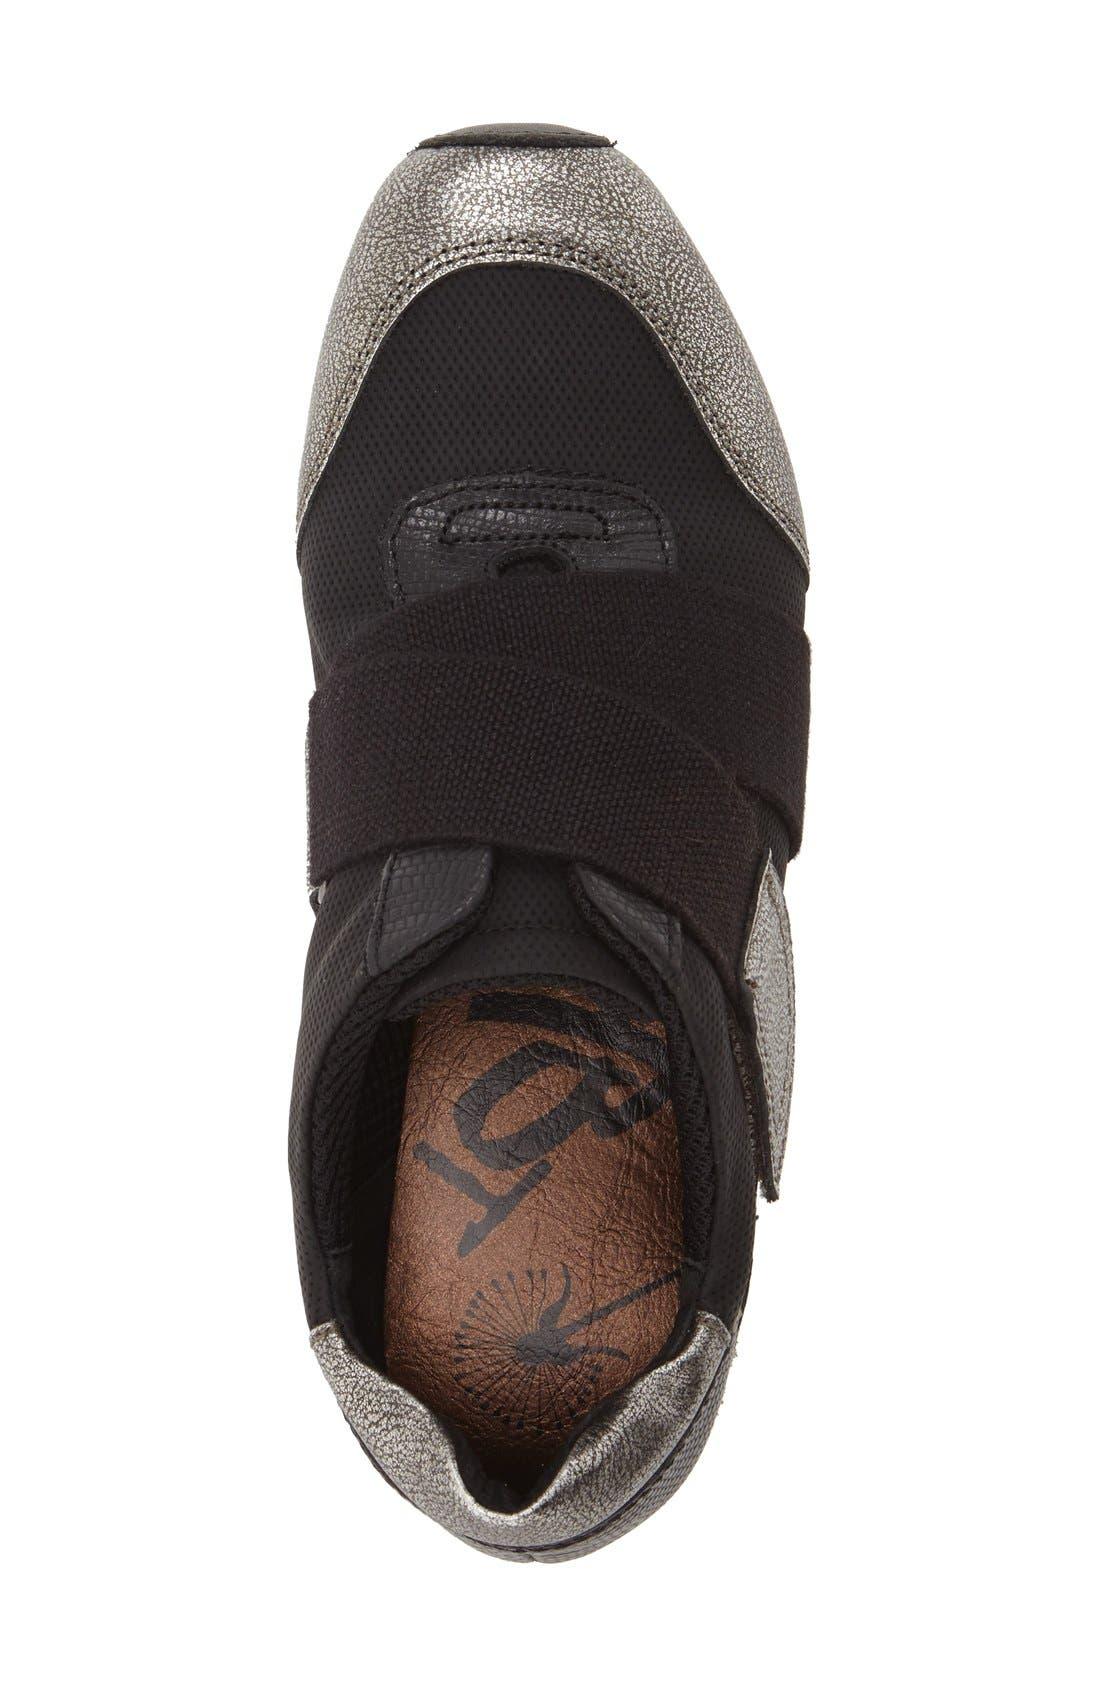 Alternate Image 3  - OTBT 'New Wave' Sneaker (Women)